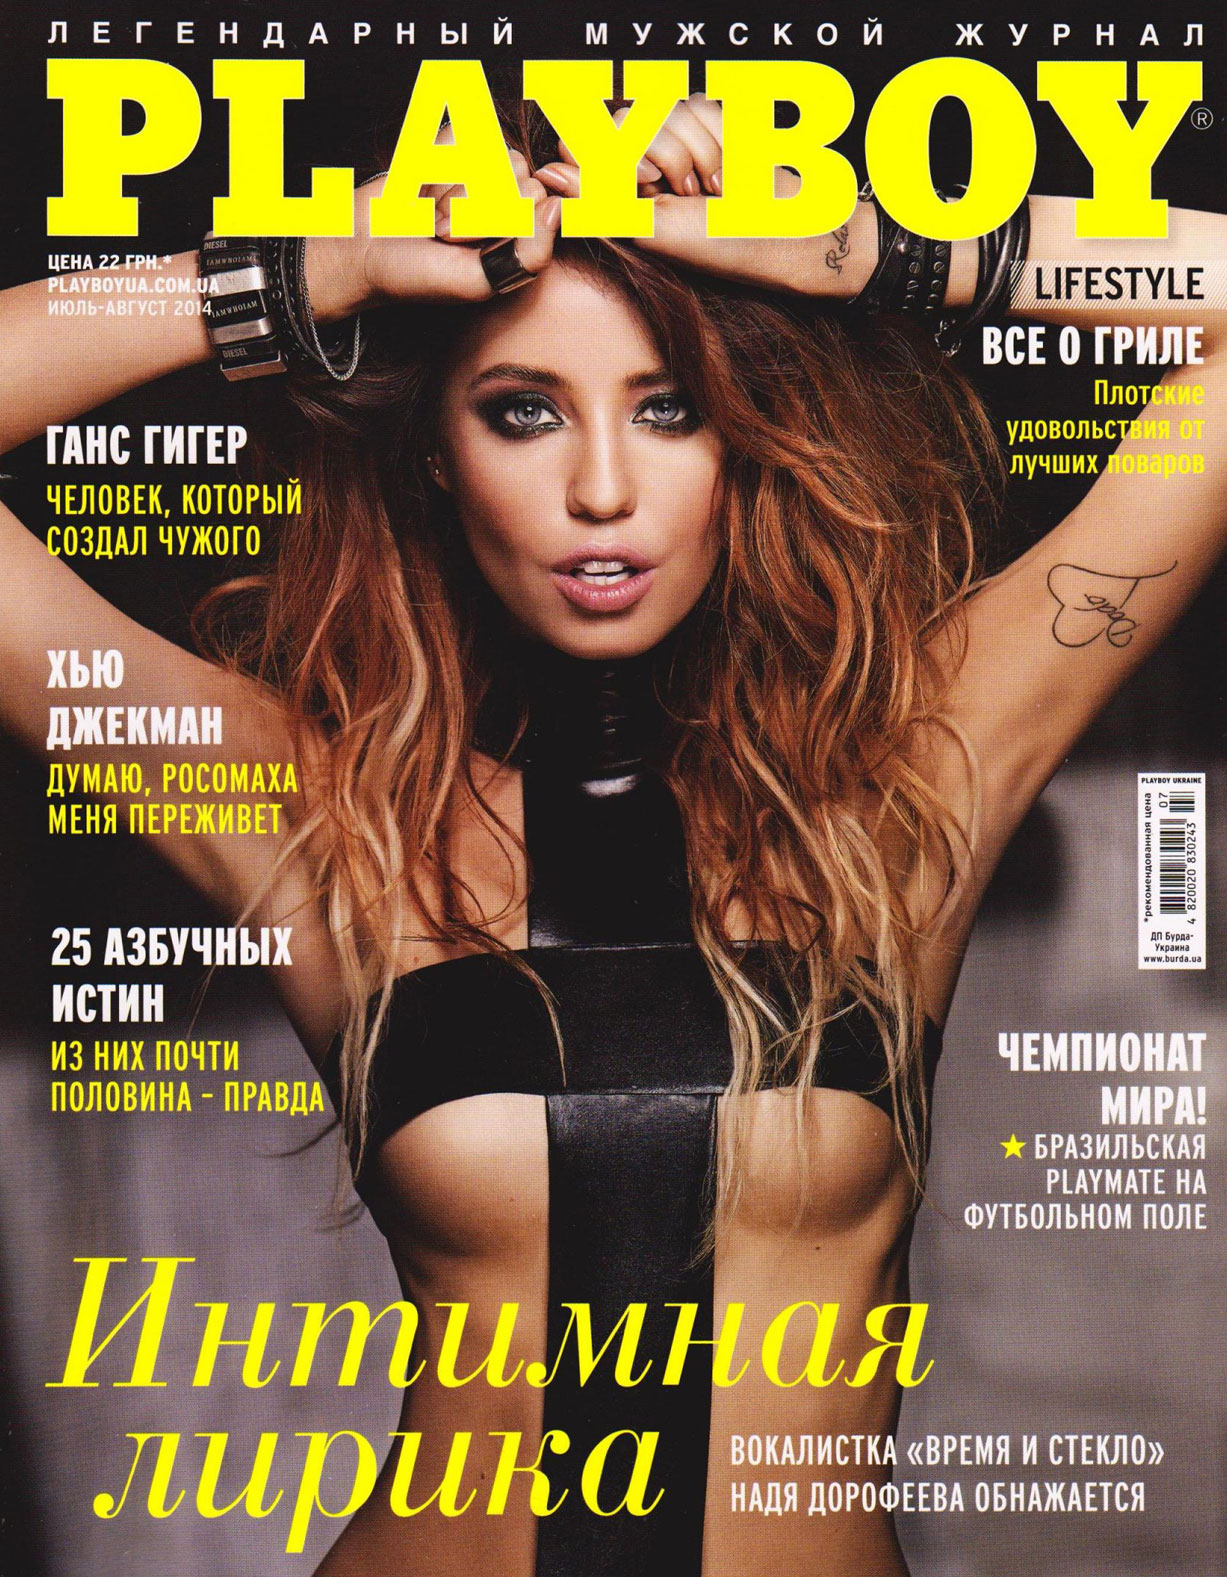 Надя Дорофеева, фотограф Александр Мордерер - Playboy Украина июль-август 2014